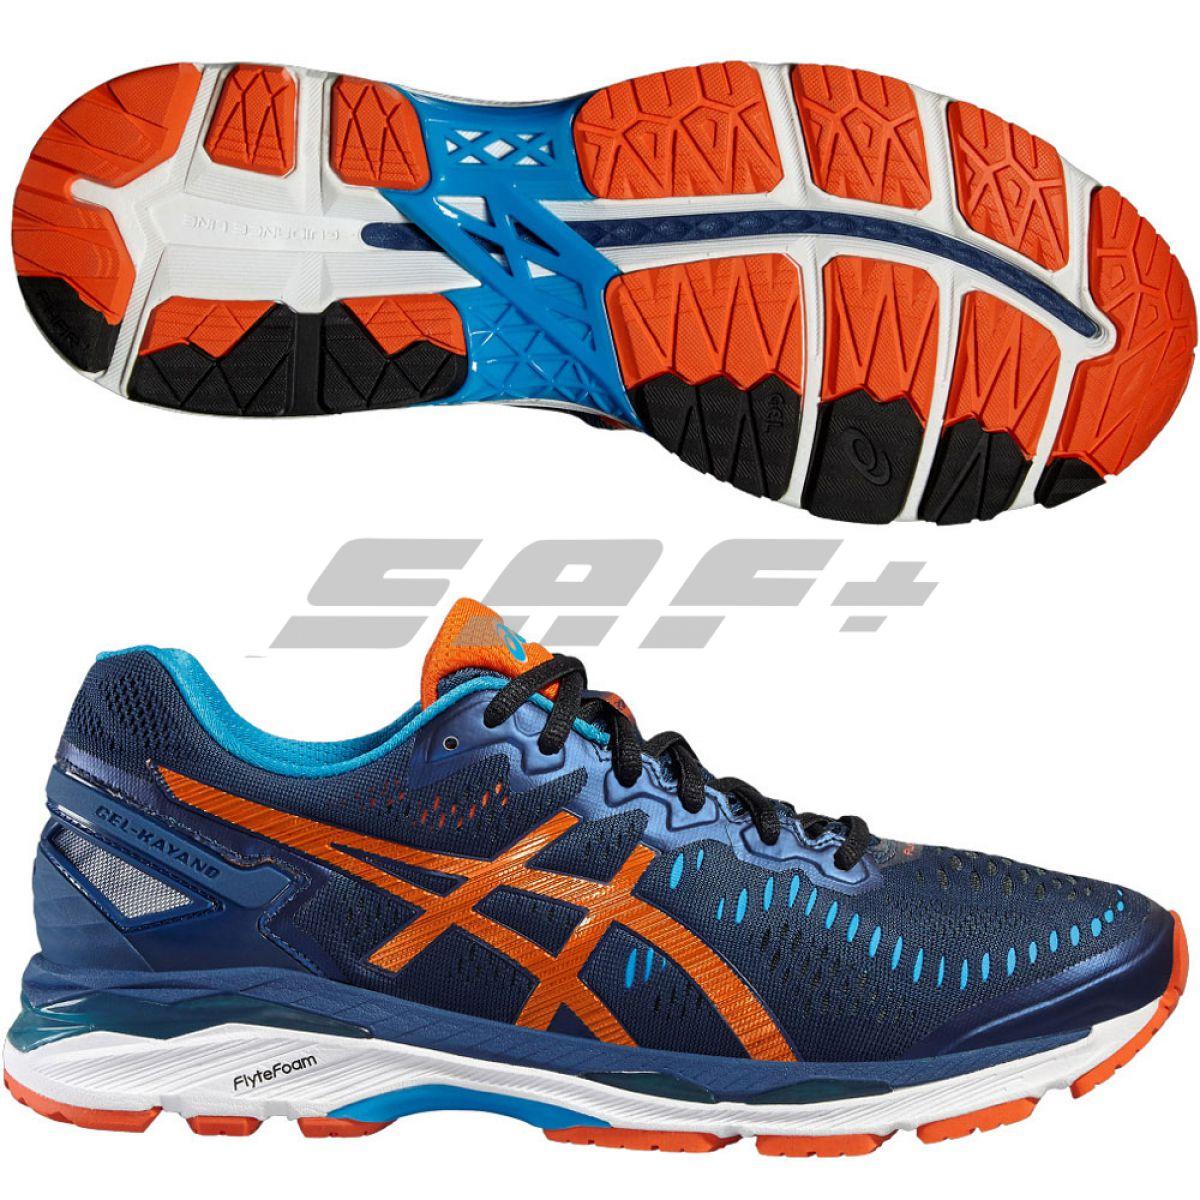 Кроссовки Asics GEL-KAYANO 23 SR cheap air sneaker 53303 e7b69 ... модель  ASICS GEL NIMBUS 16 по каталогу ... 6dc9567872e